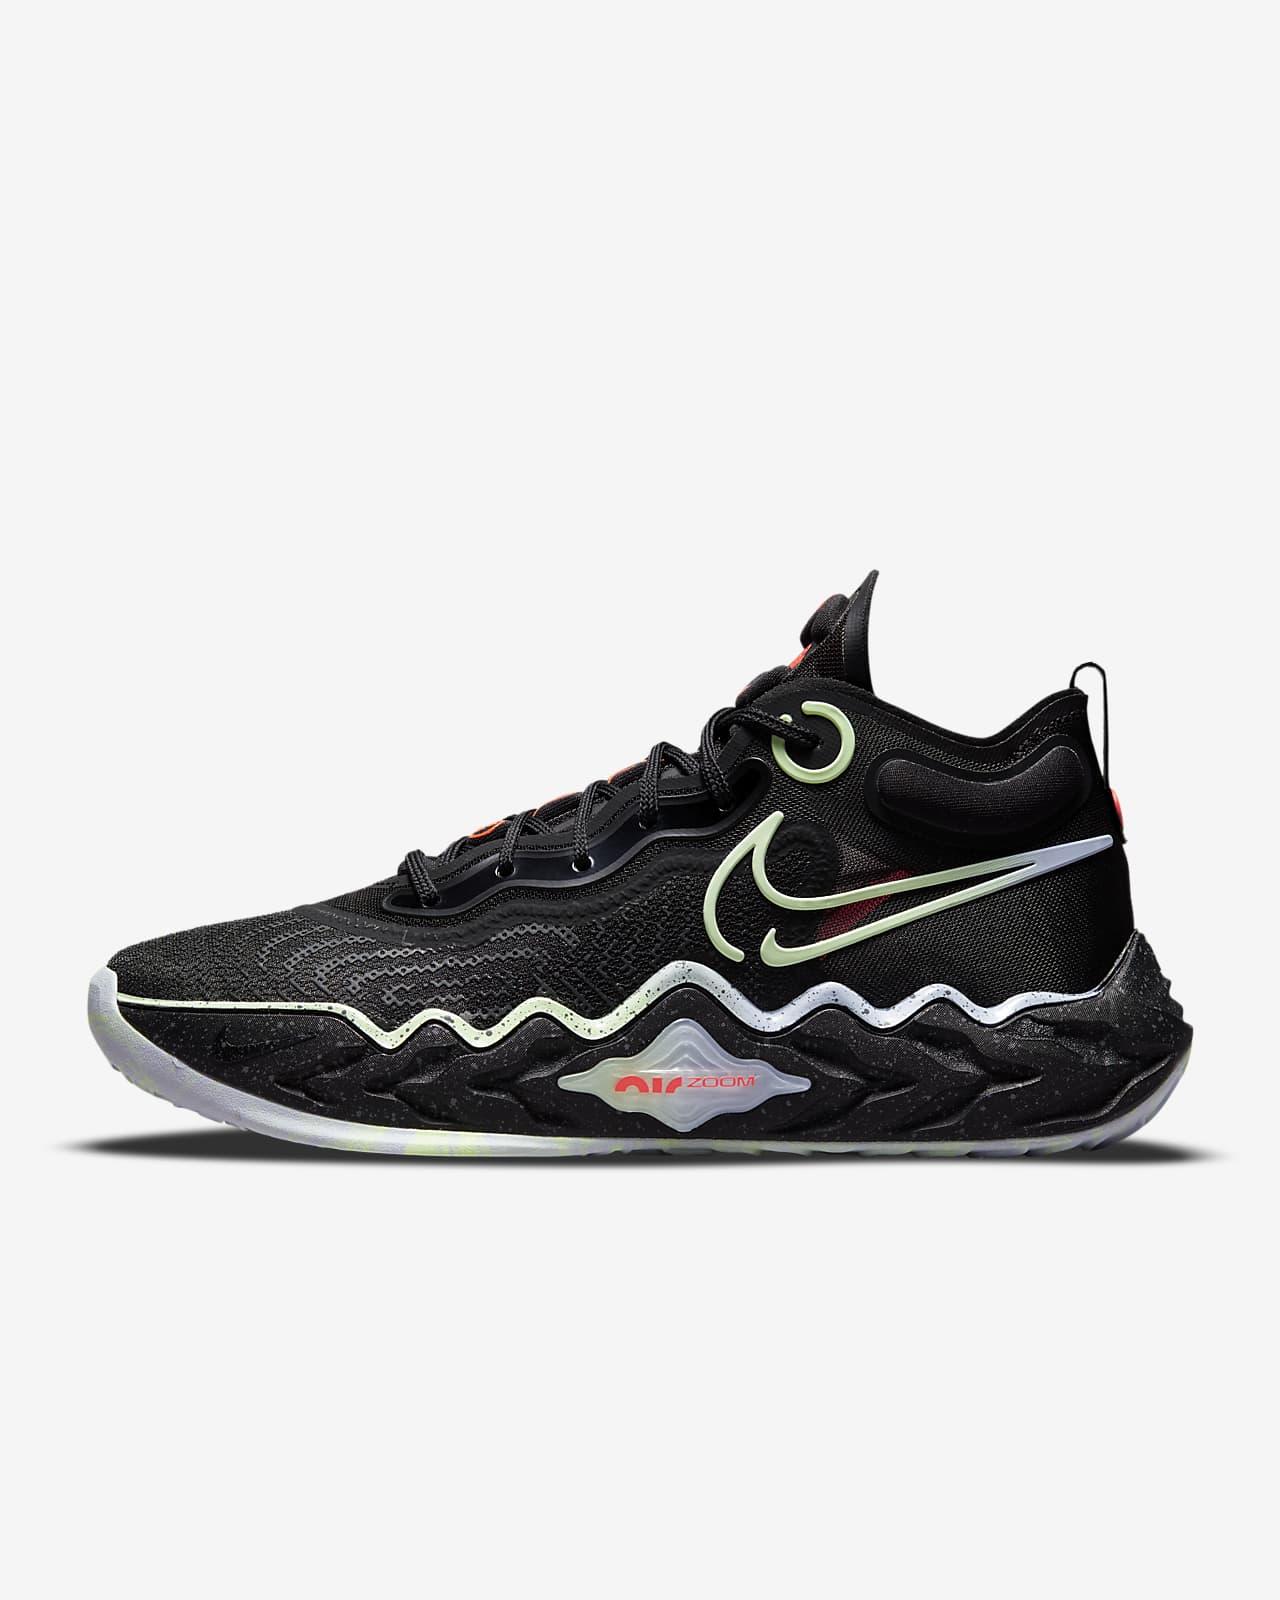 Nike Air Zoom G.T.Run Basketbalschoen